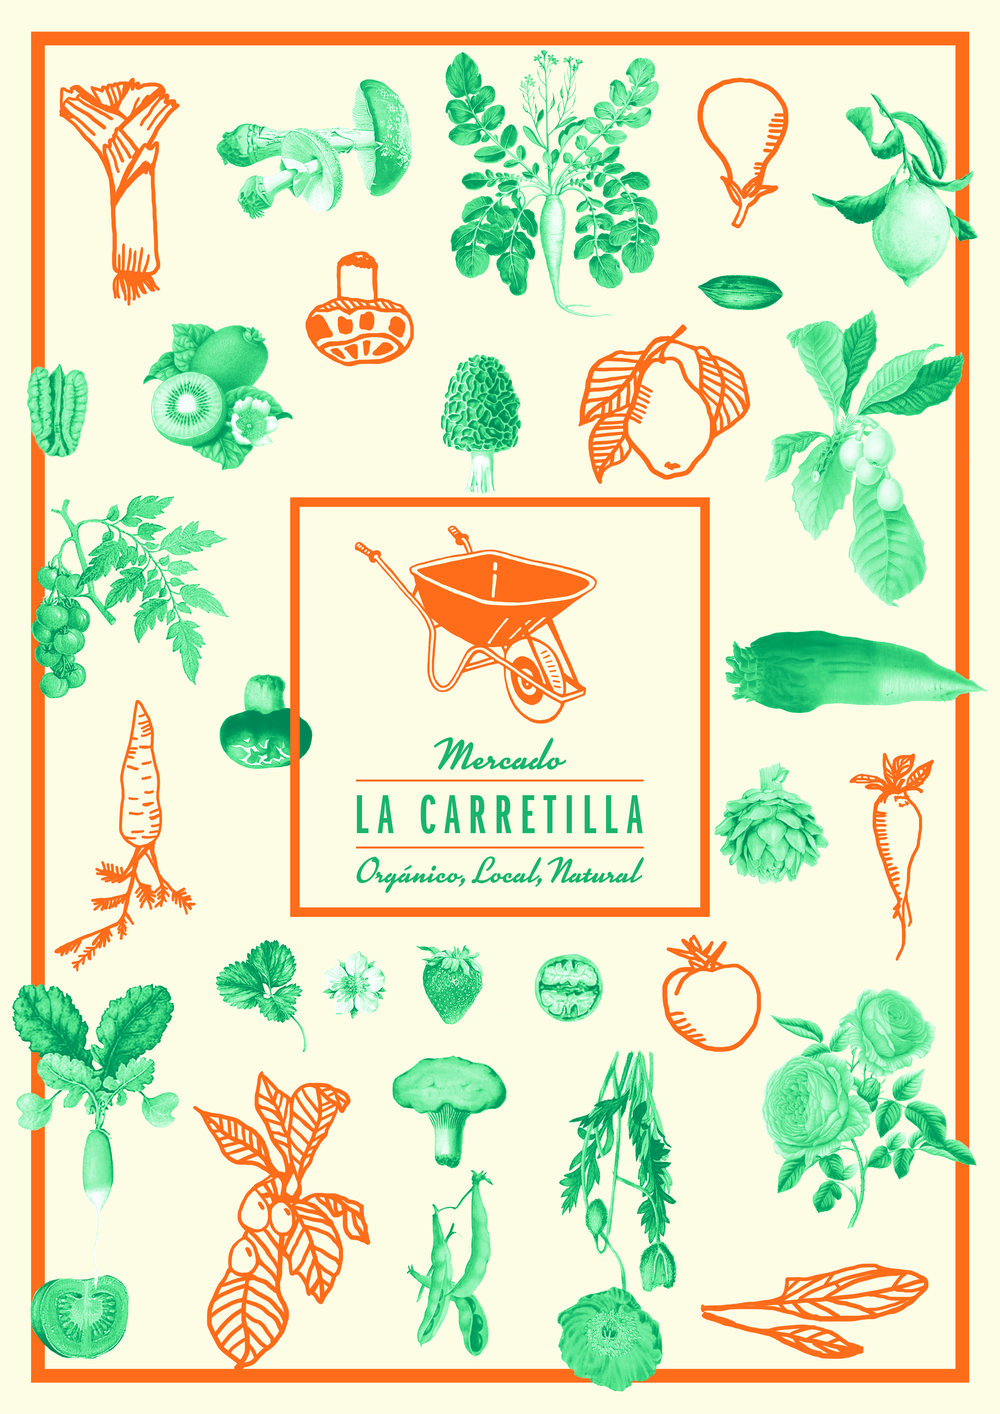 LACARRETILLA_ARTE.jpg